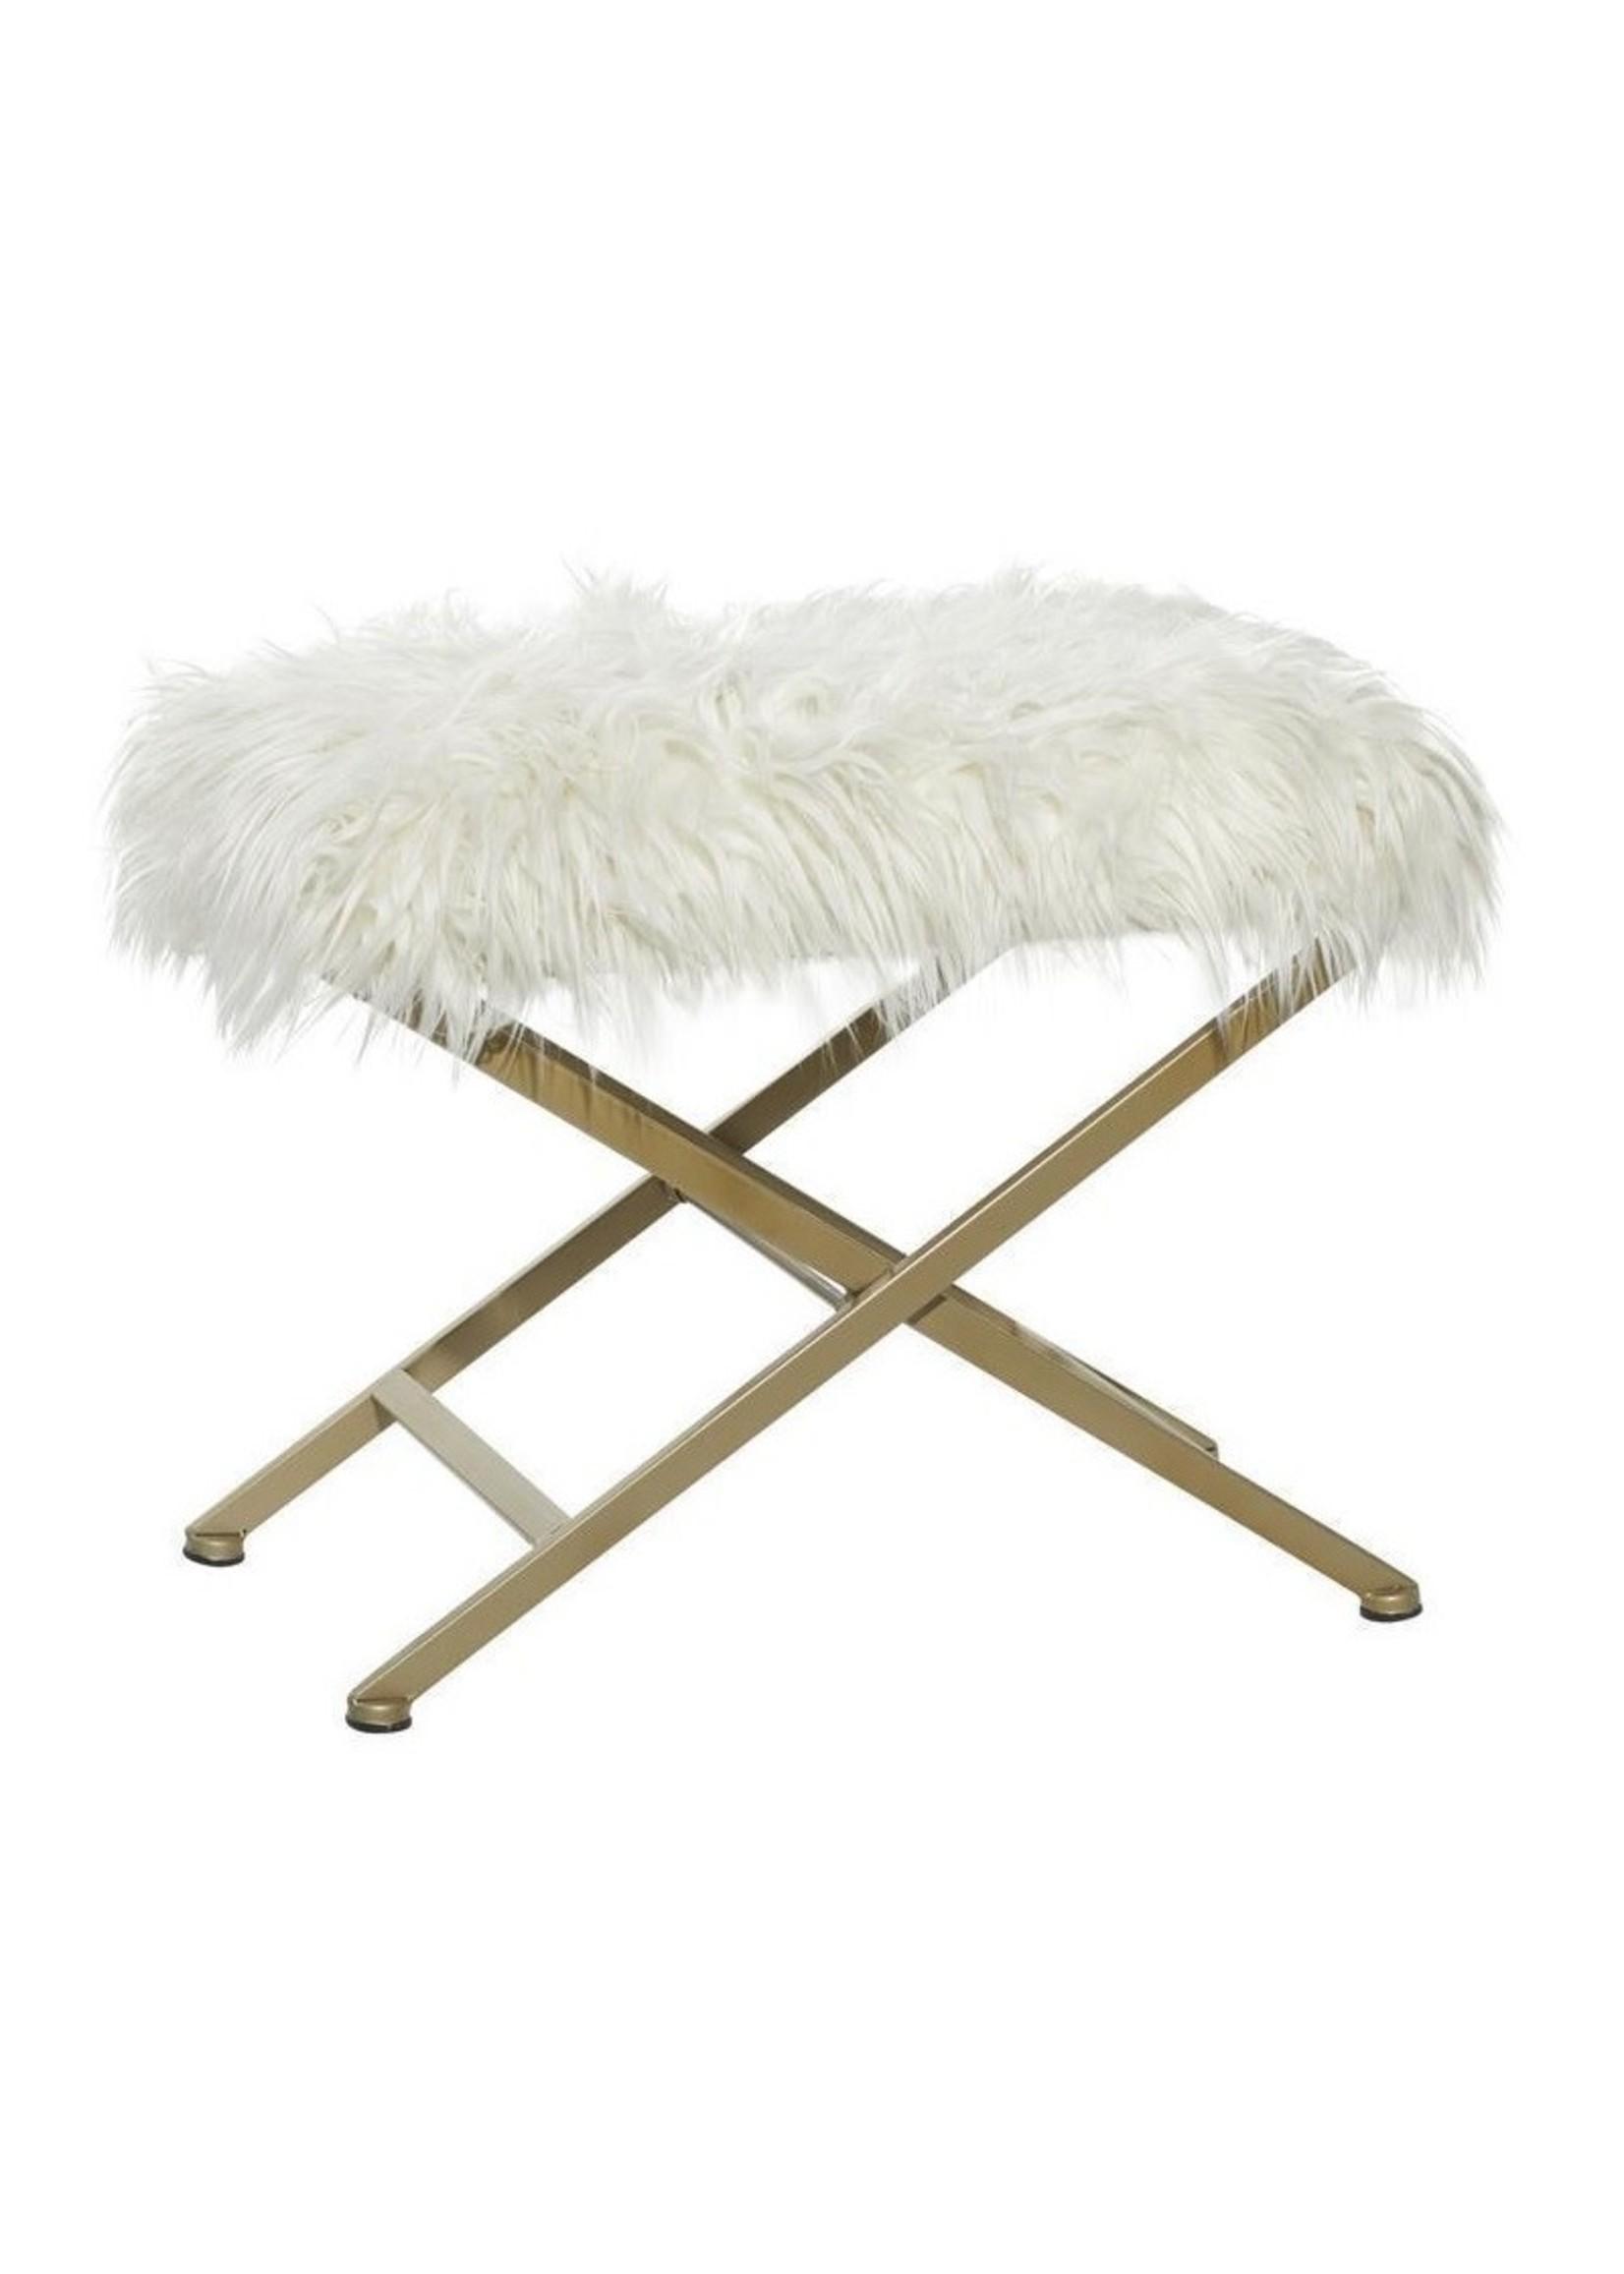 UMA Enterprises 85473 Fur Stool White